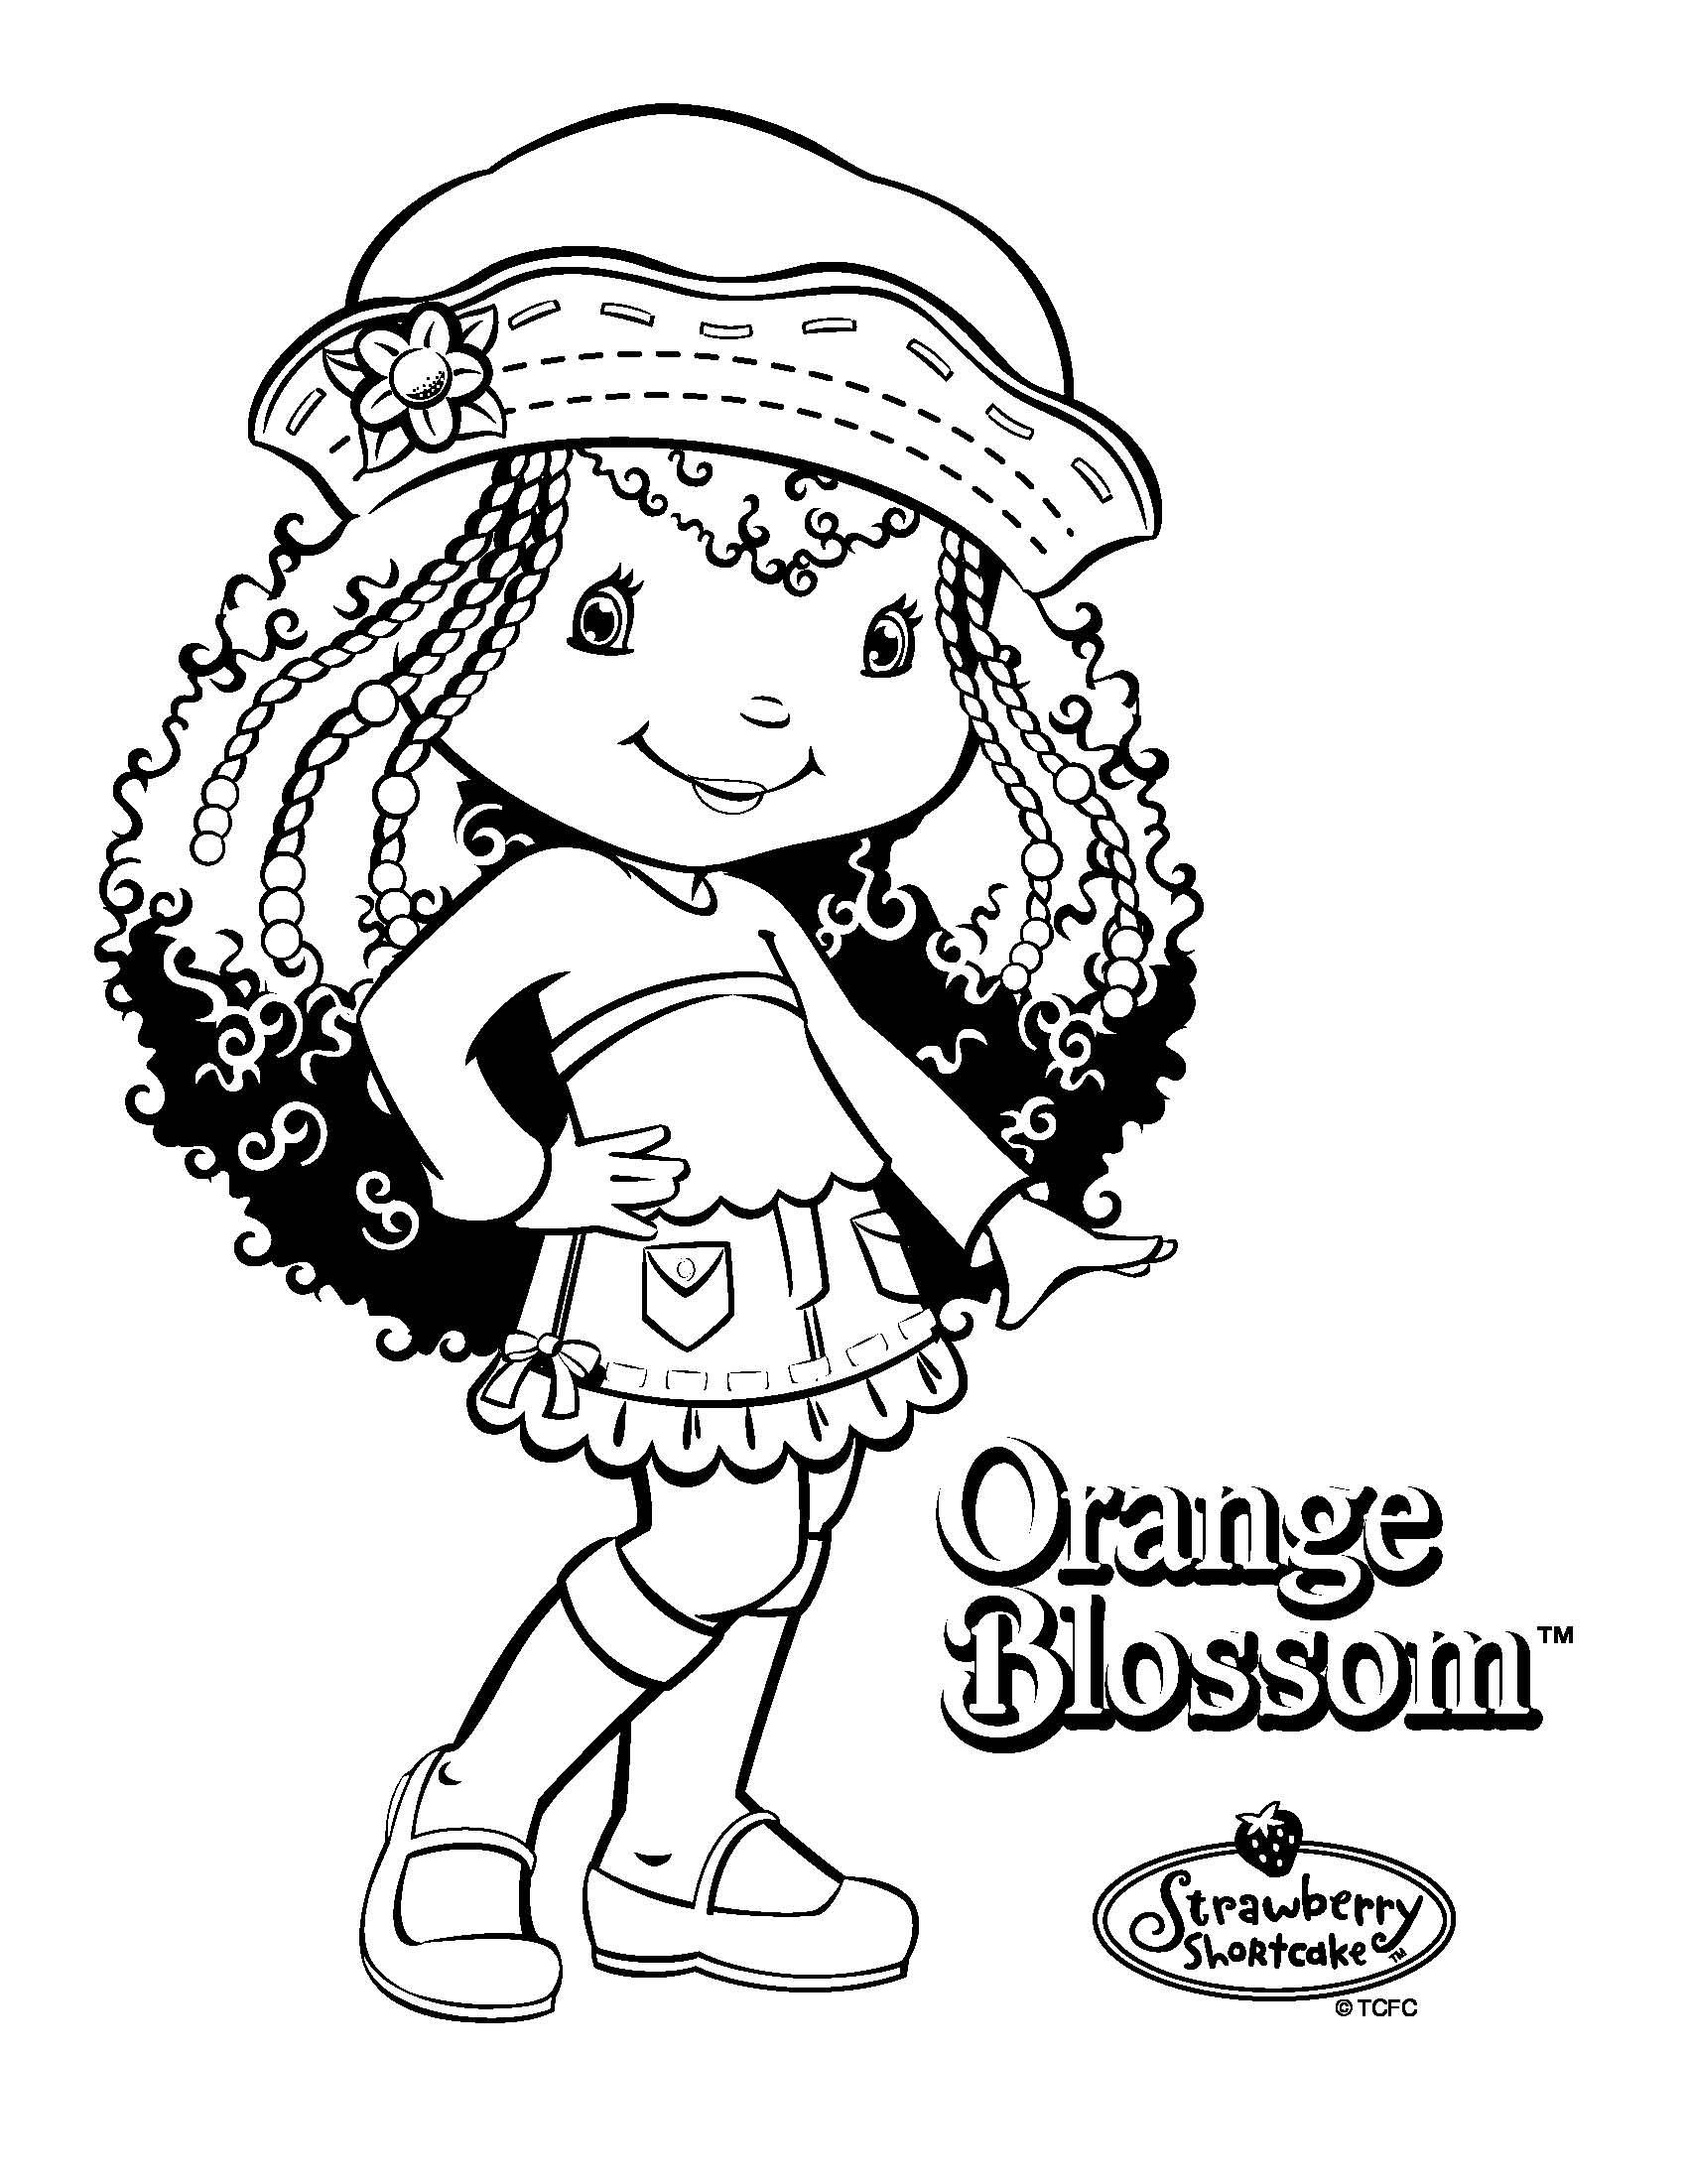 pobarvanke - orange blossom